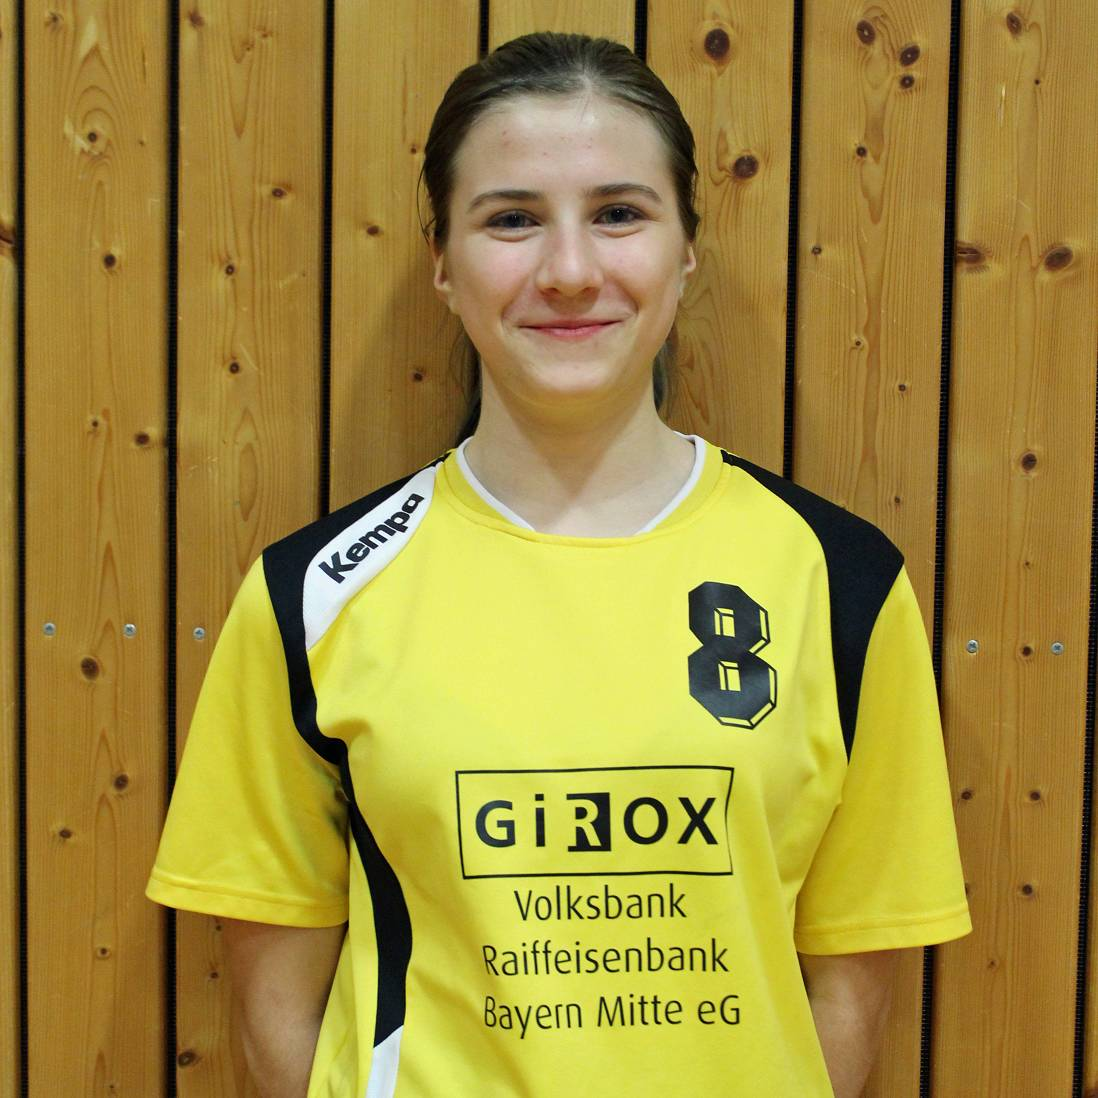 Camilla Jorgel